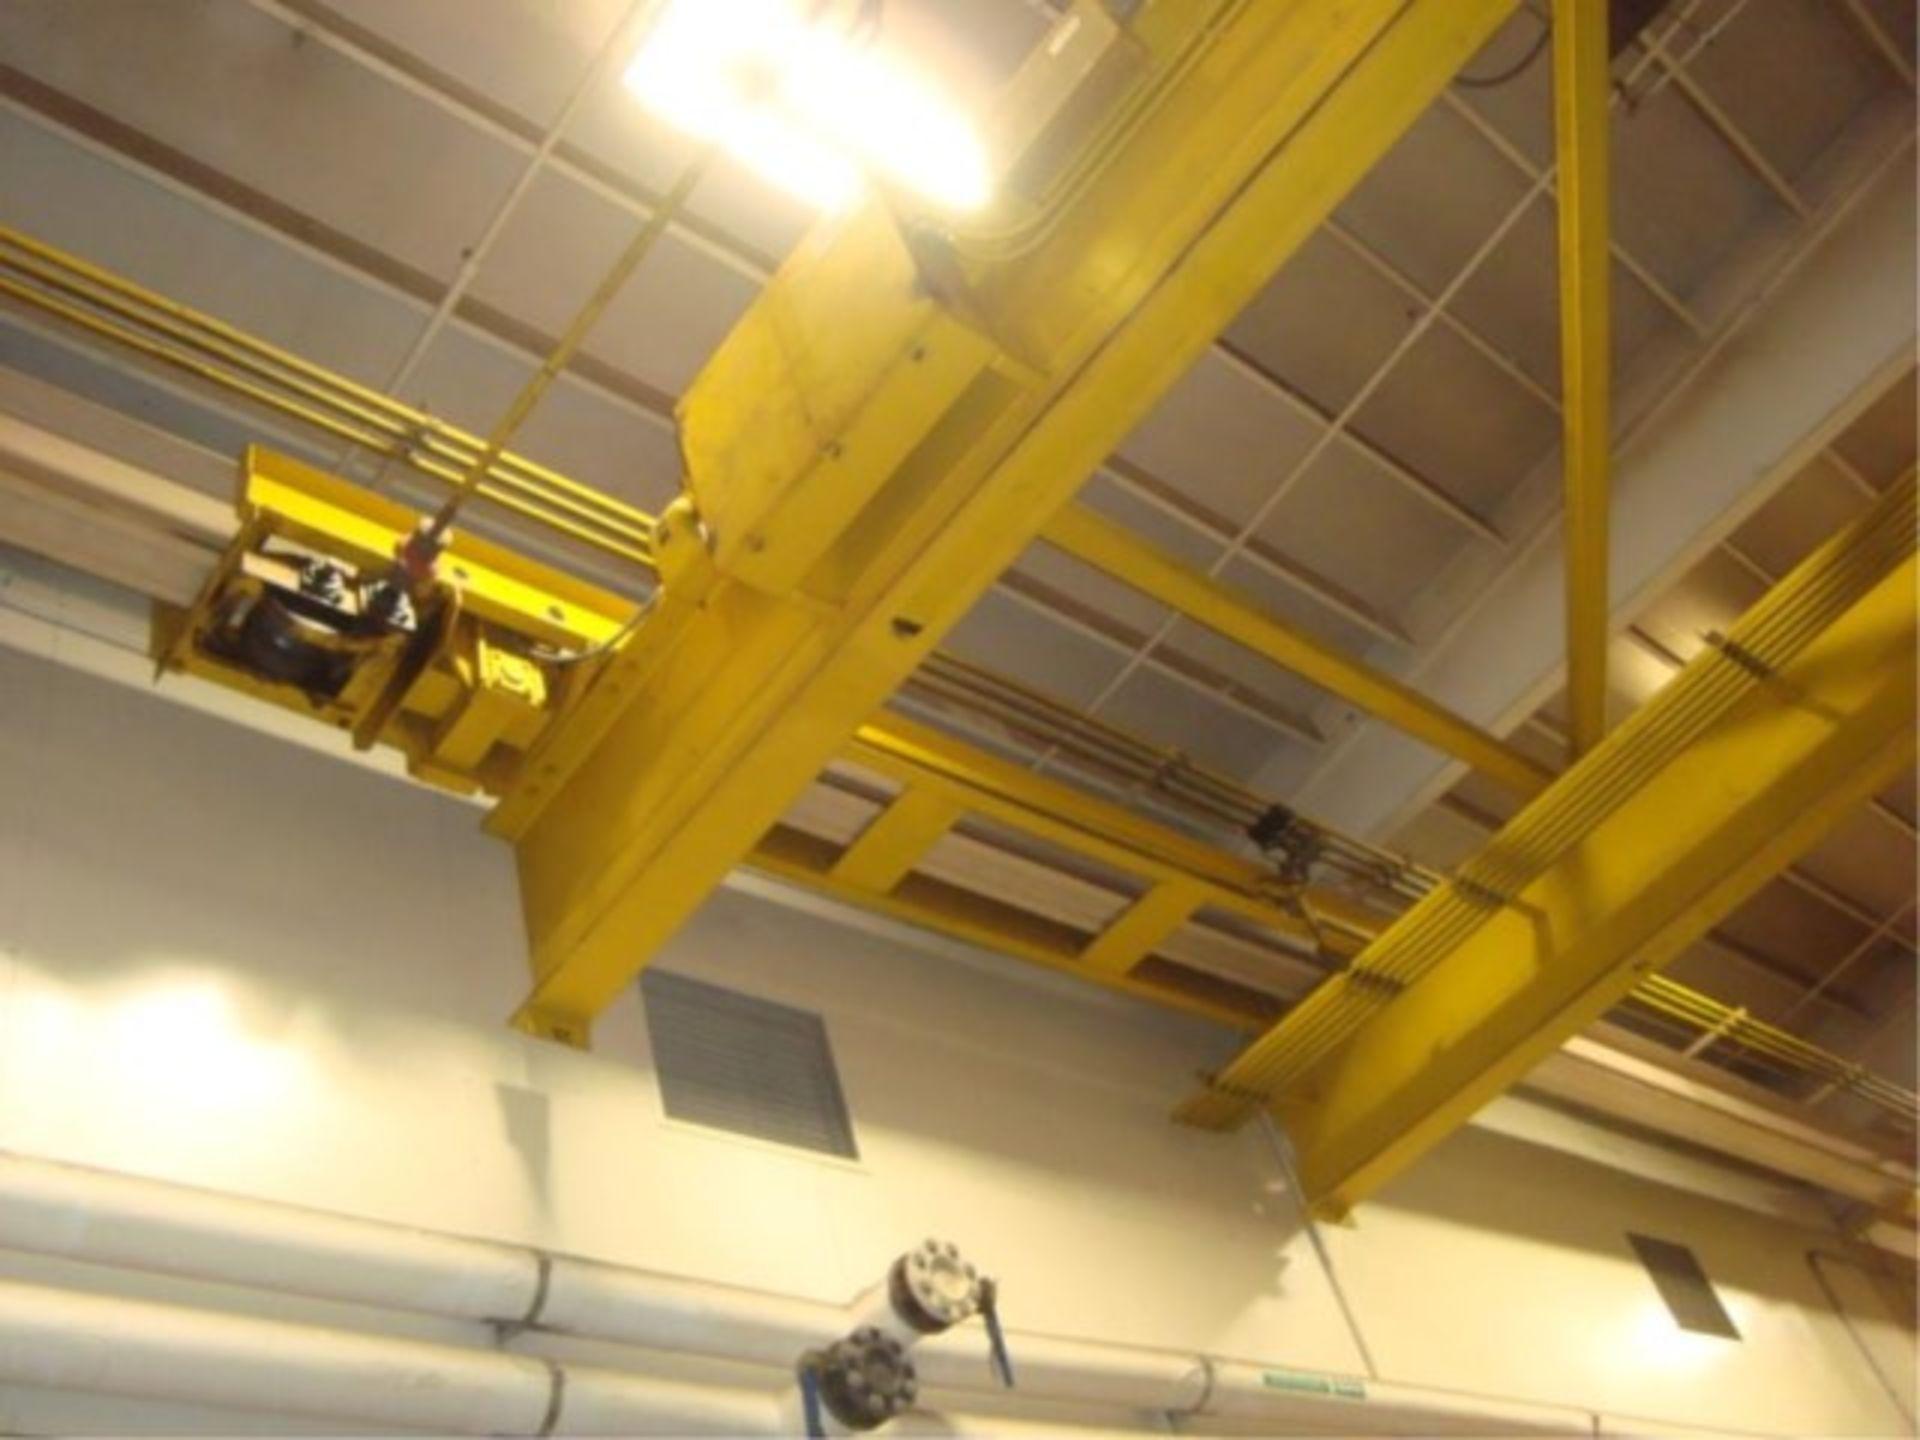 Lot 119 - 10-Ton Capacity Overhead Bridge Crane